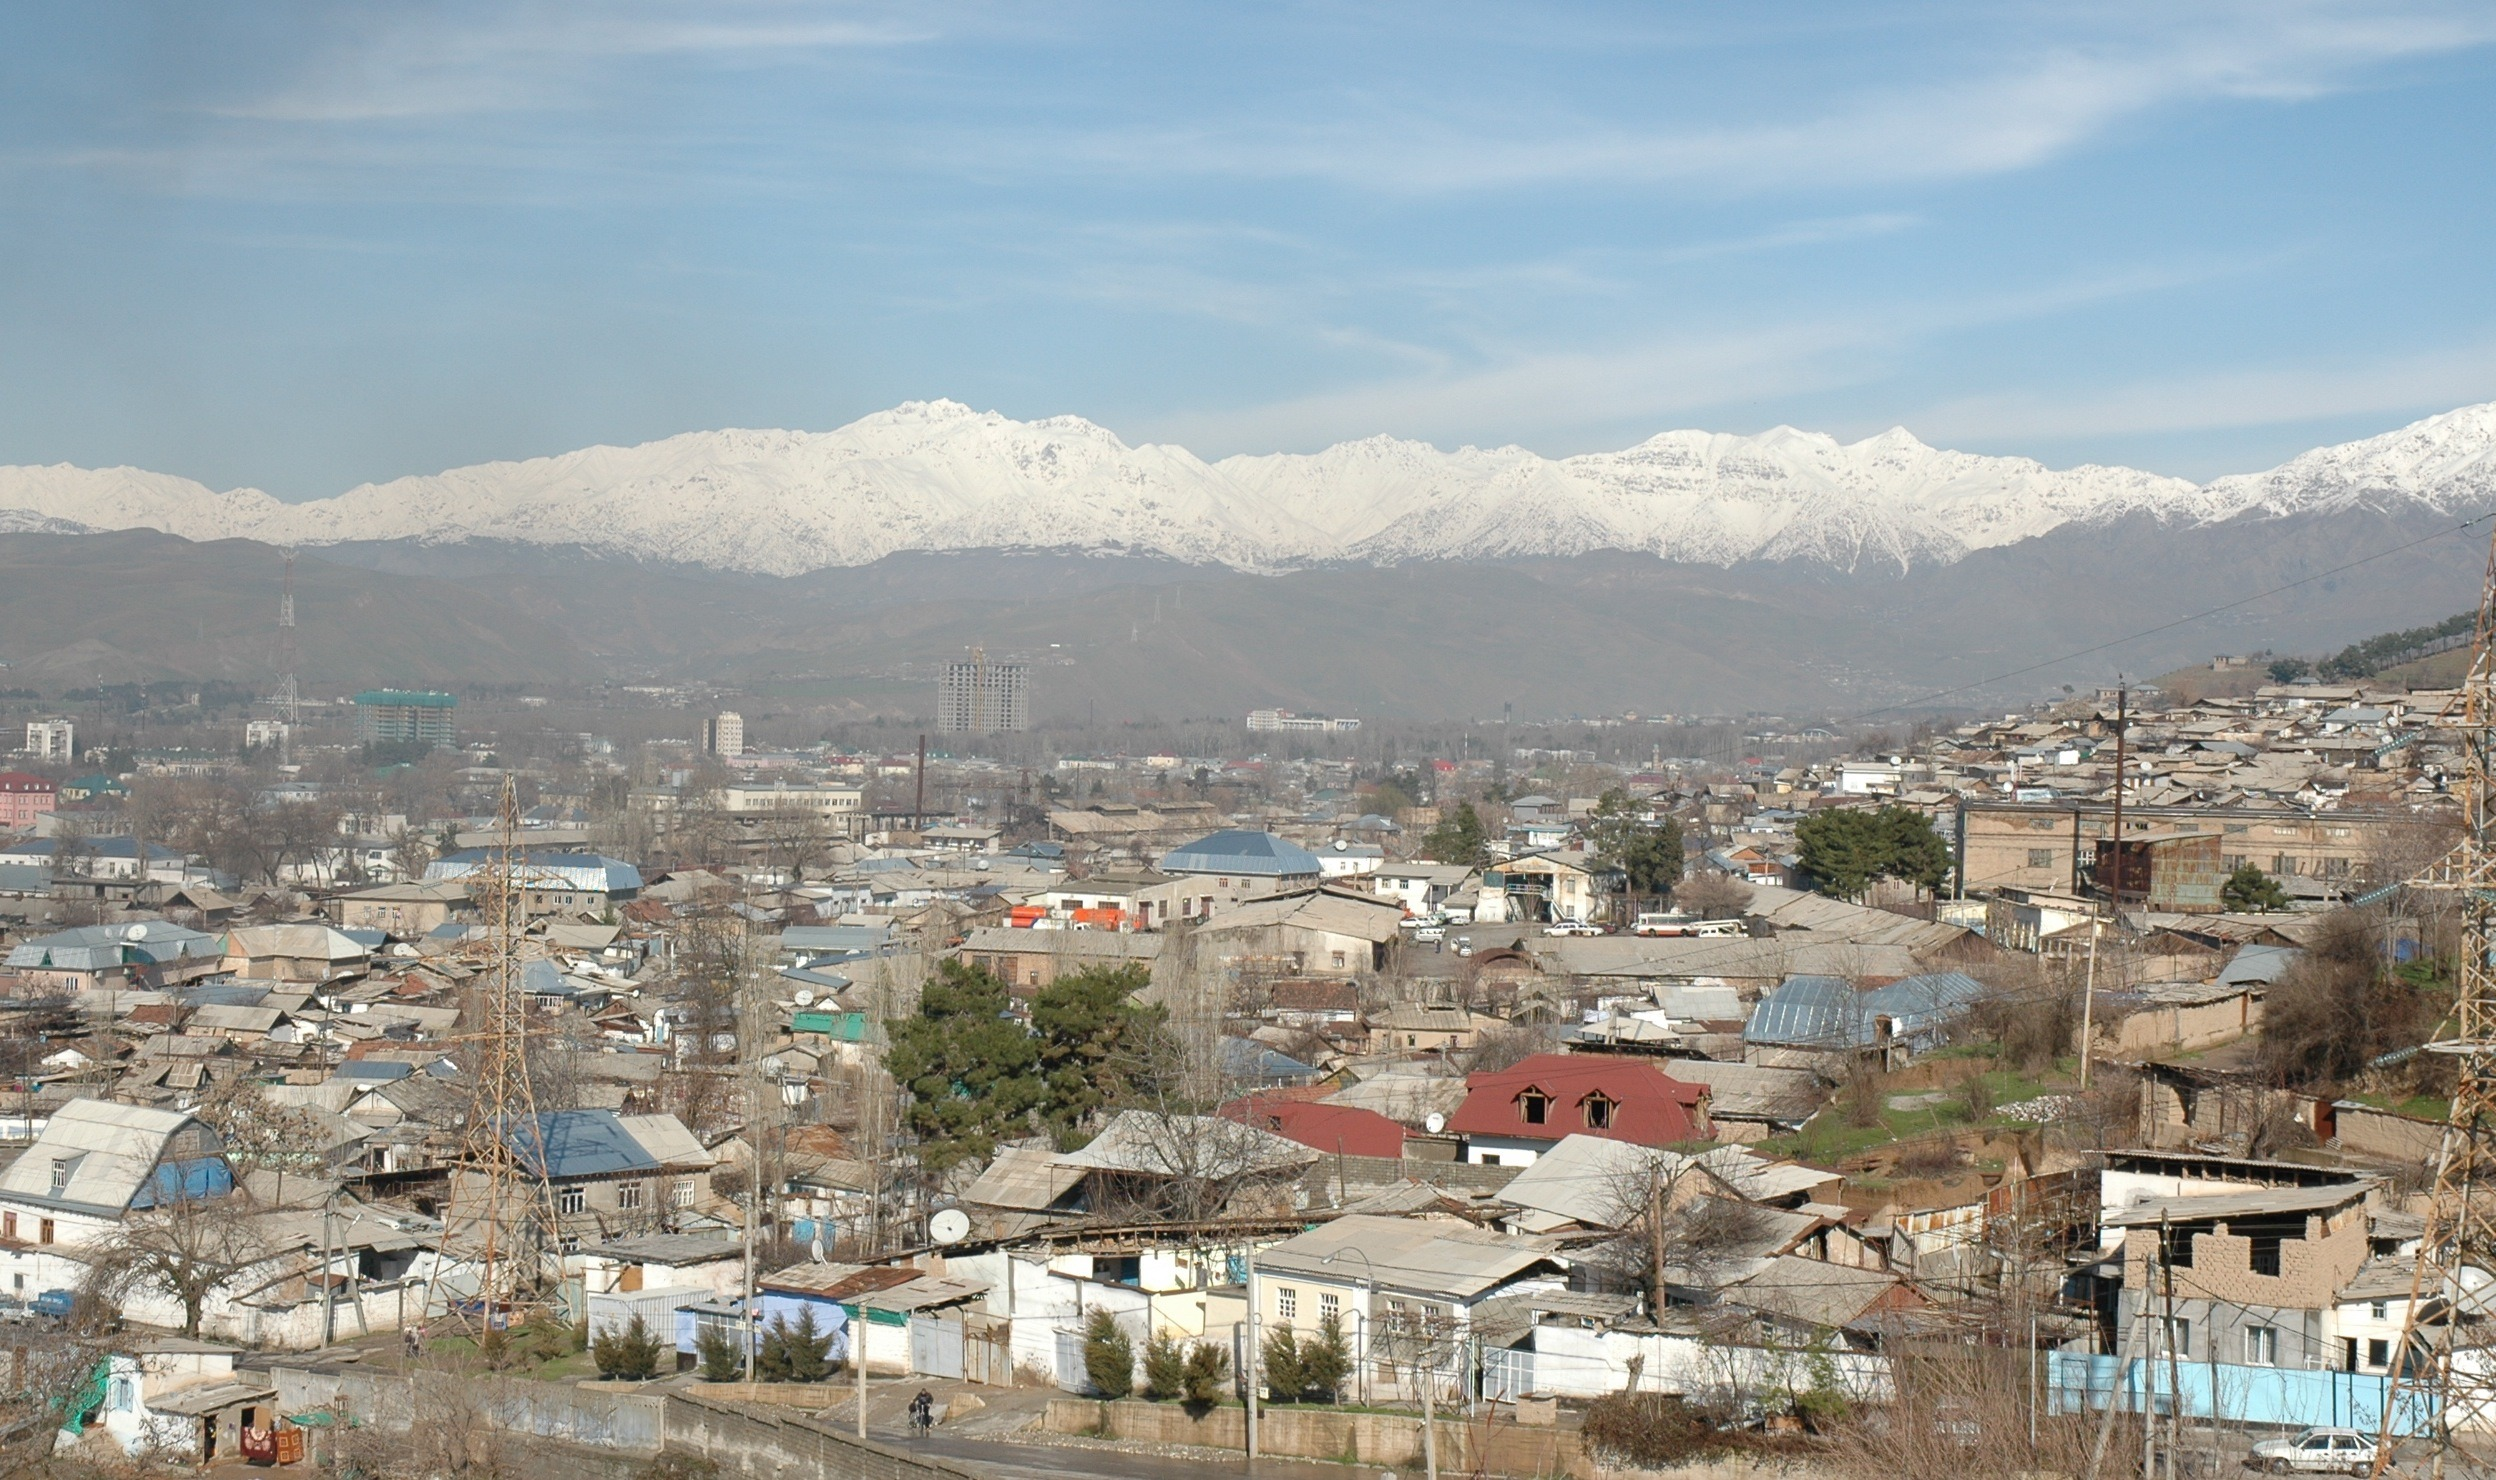 Dushanbe, capitala Tadjikistanului (Wikimedia Commons)